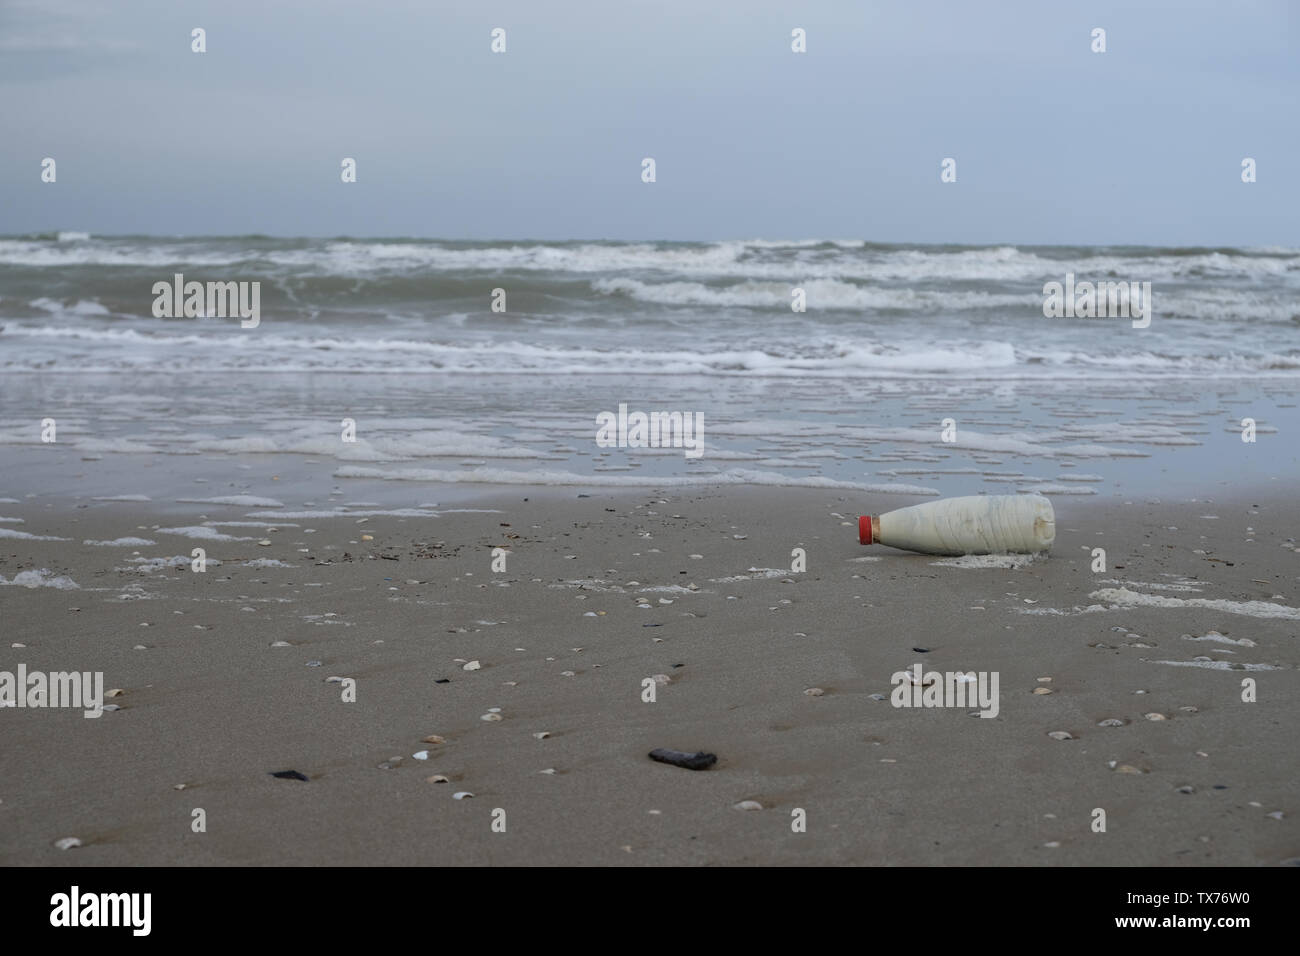 Winter sandy beach in Rimini, Italy. Empty during the off season. - Stock Image